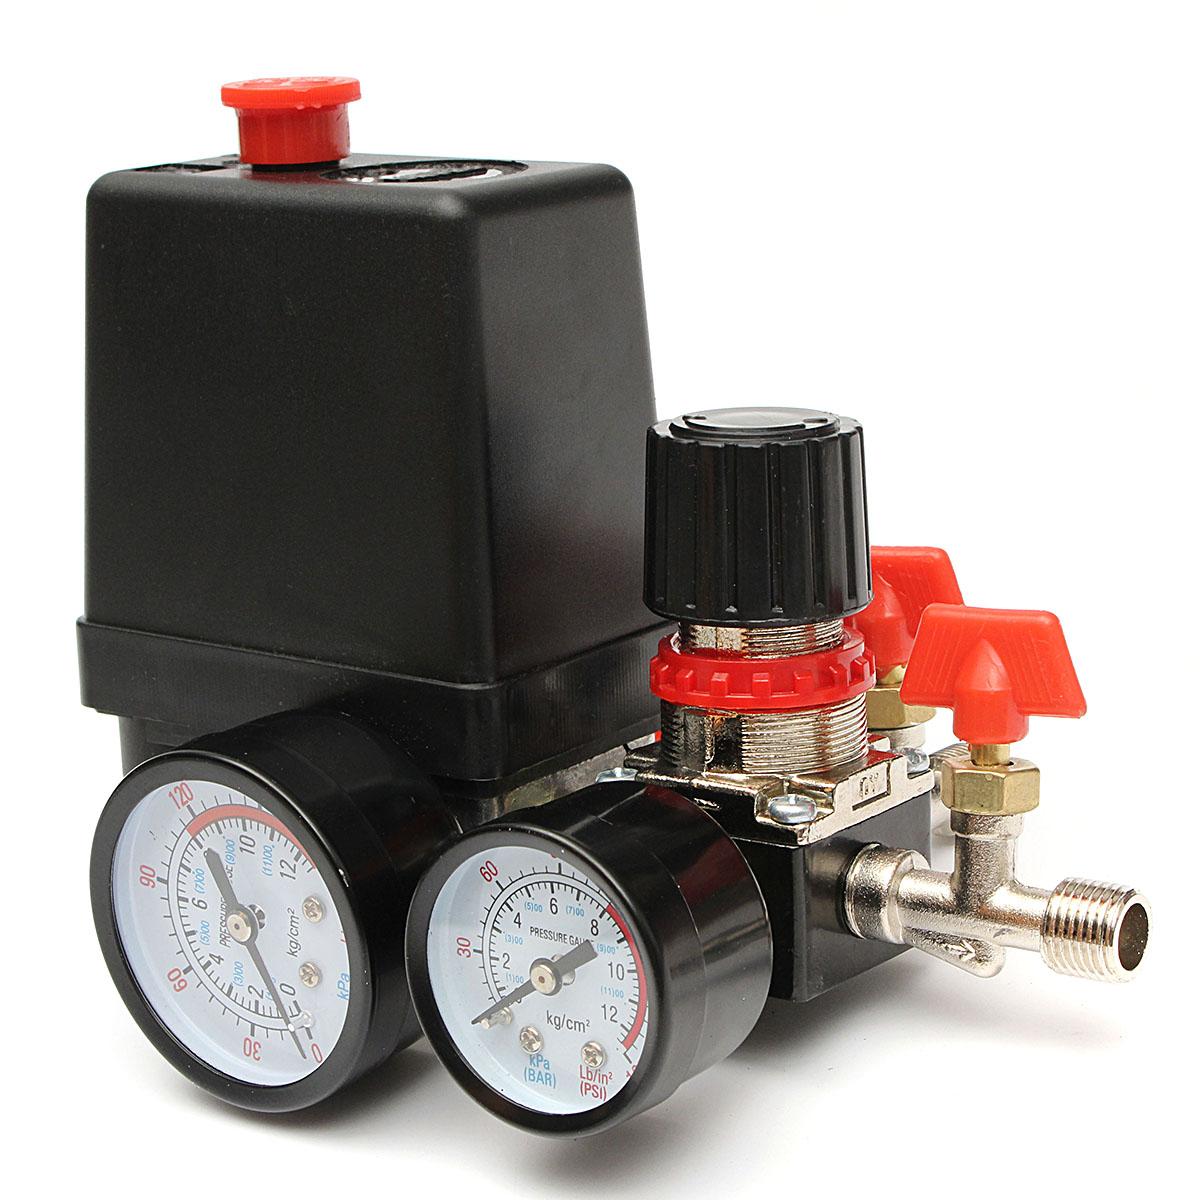 125PSI Air Compressor Pressure Valve Switch Control